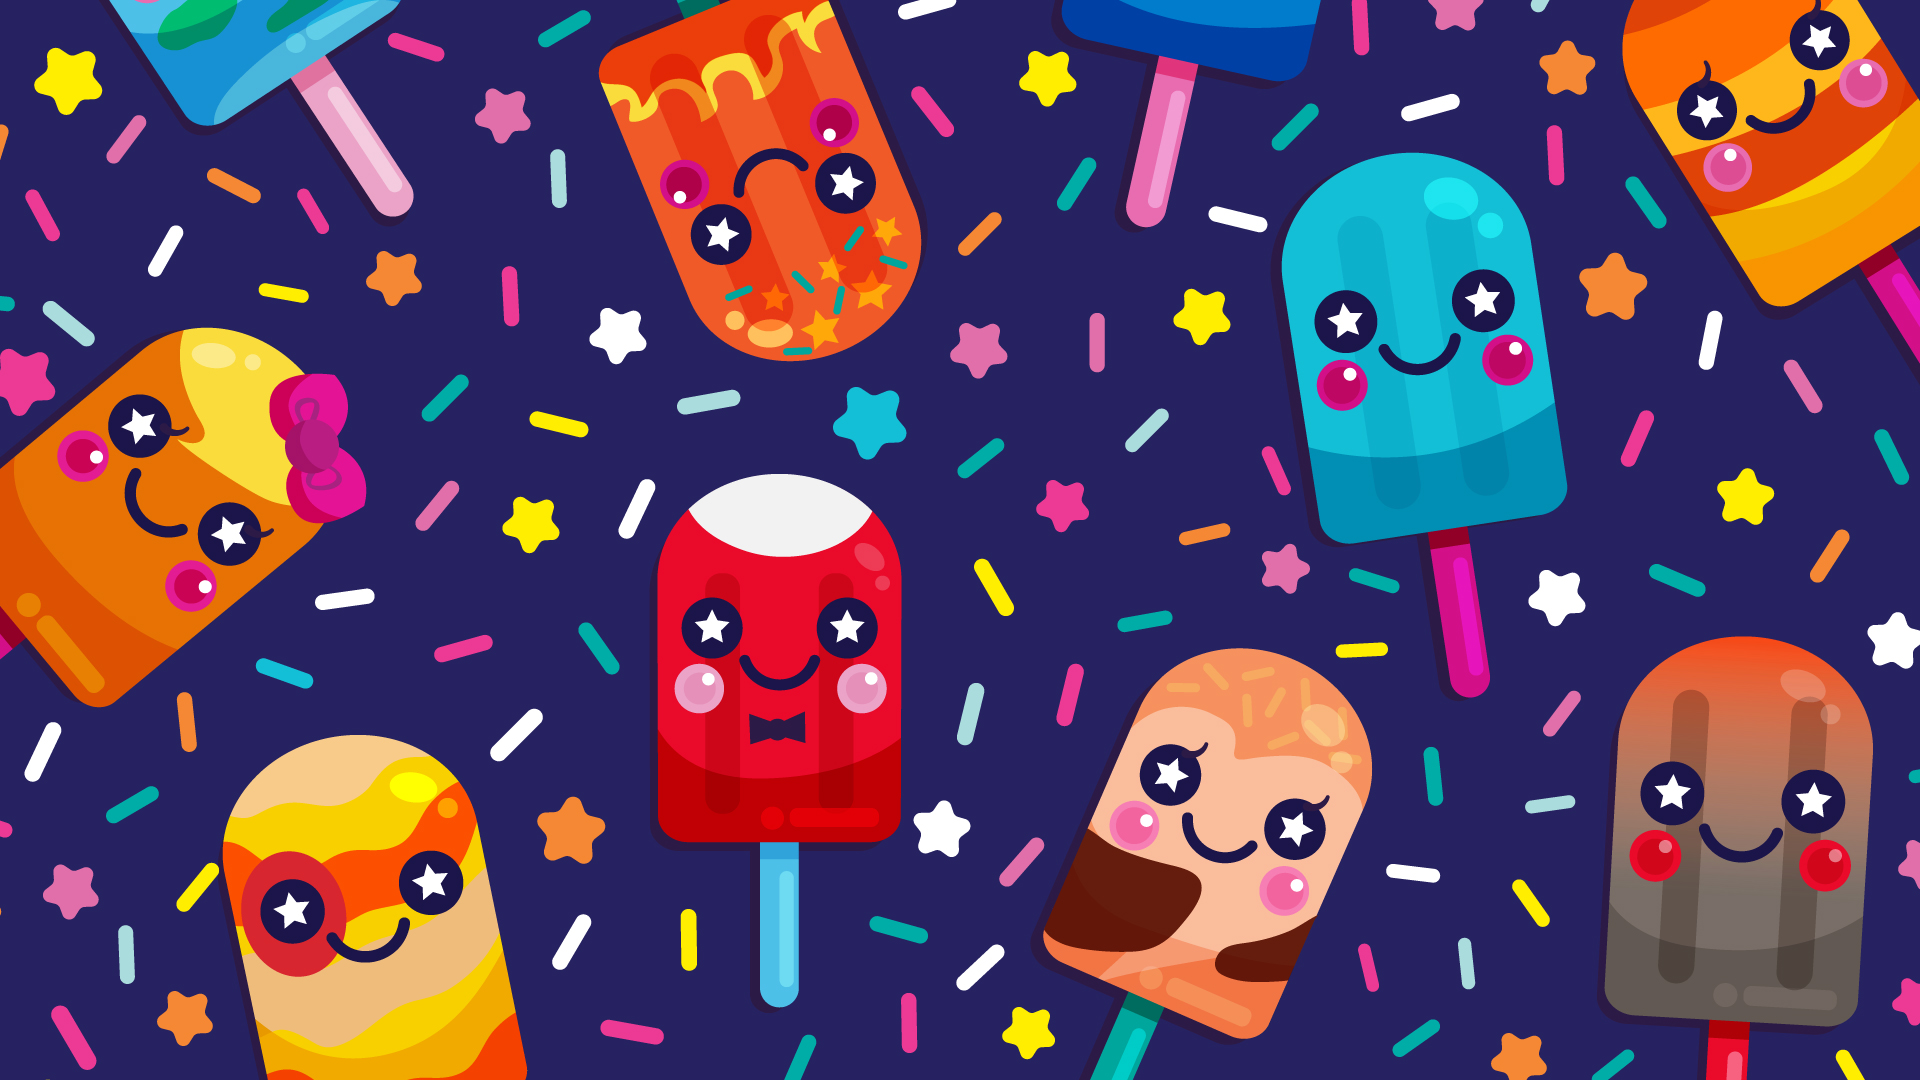 Cosmo Pops Wallpaper